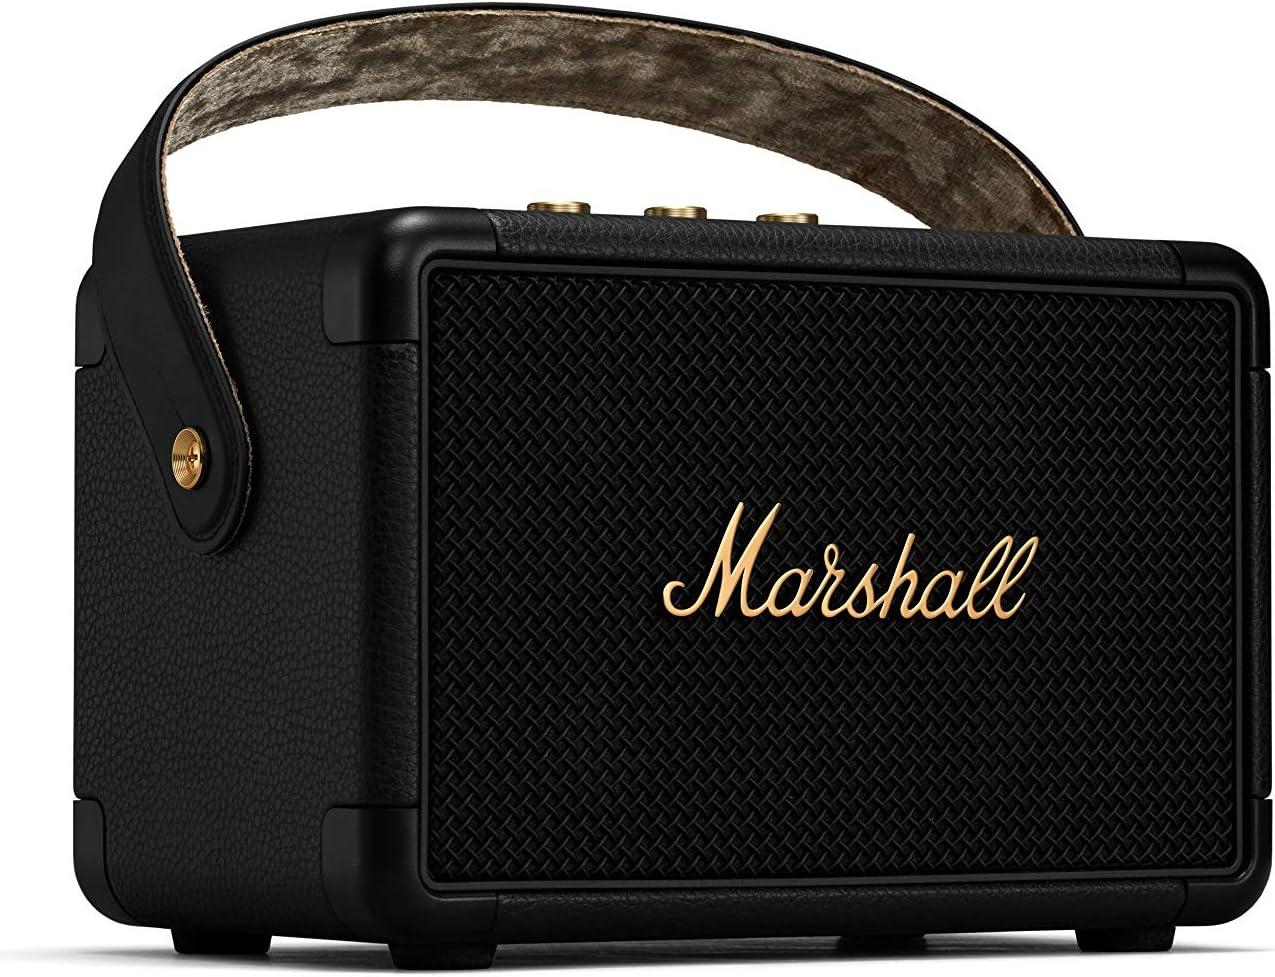 Marshall Kilburn II Altavoz portátil con Bluetooth - Negro y latón